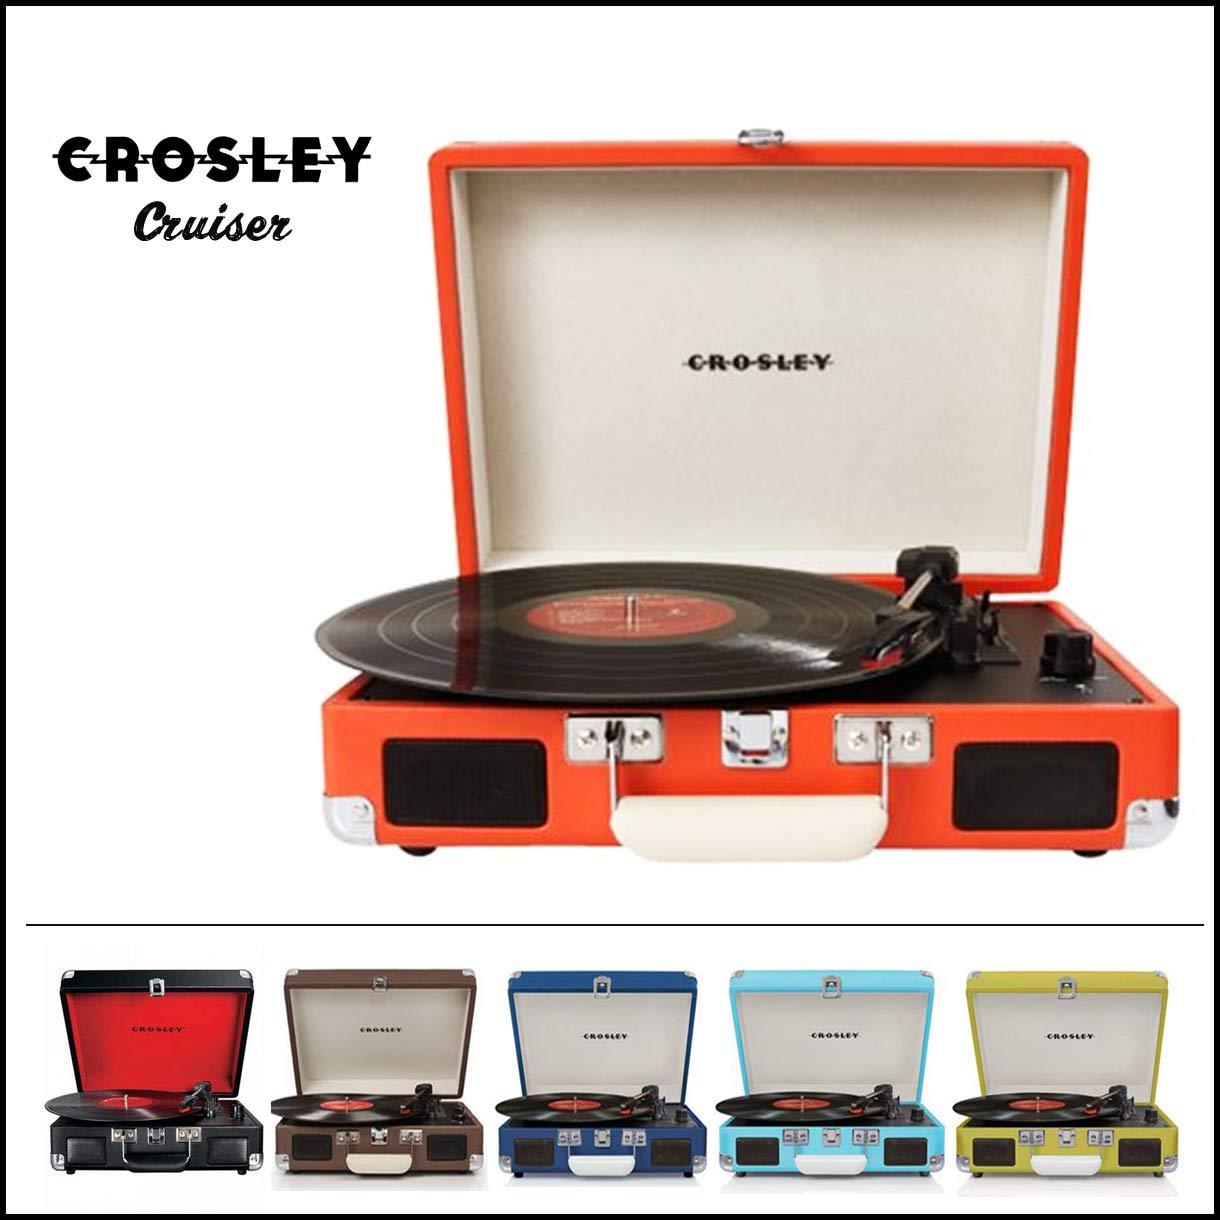 Giradischi Crosley Cruiser